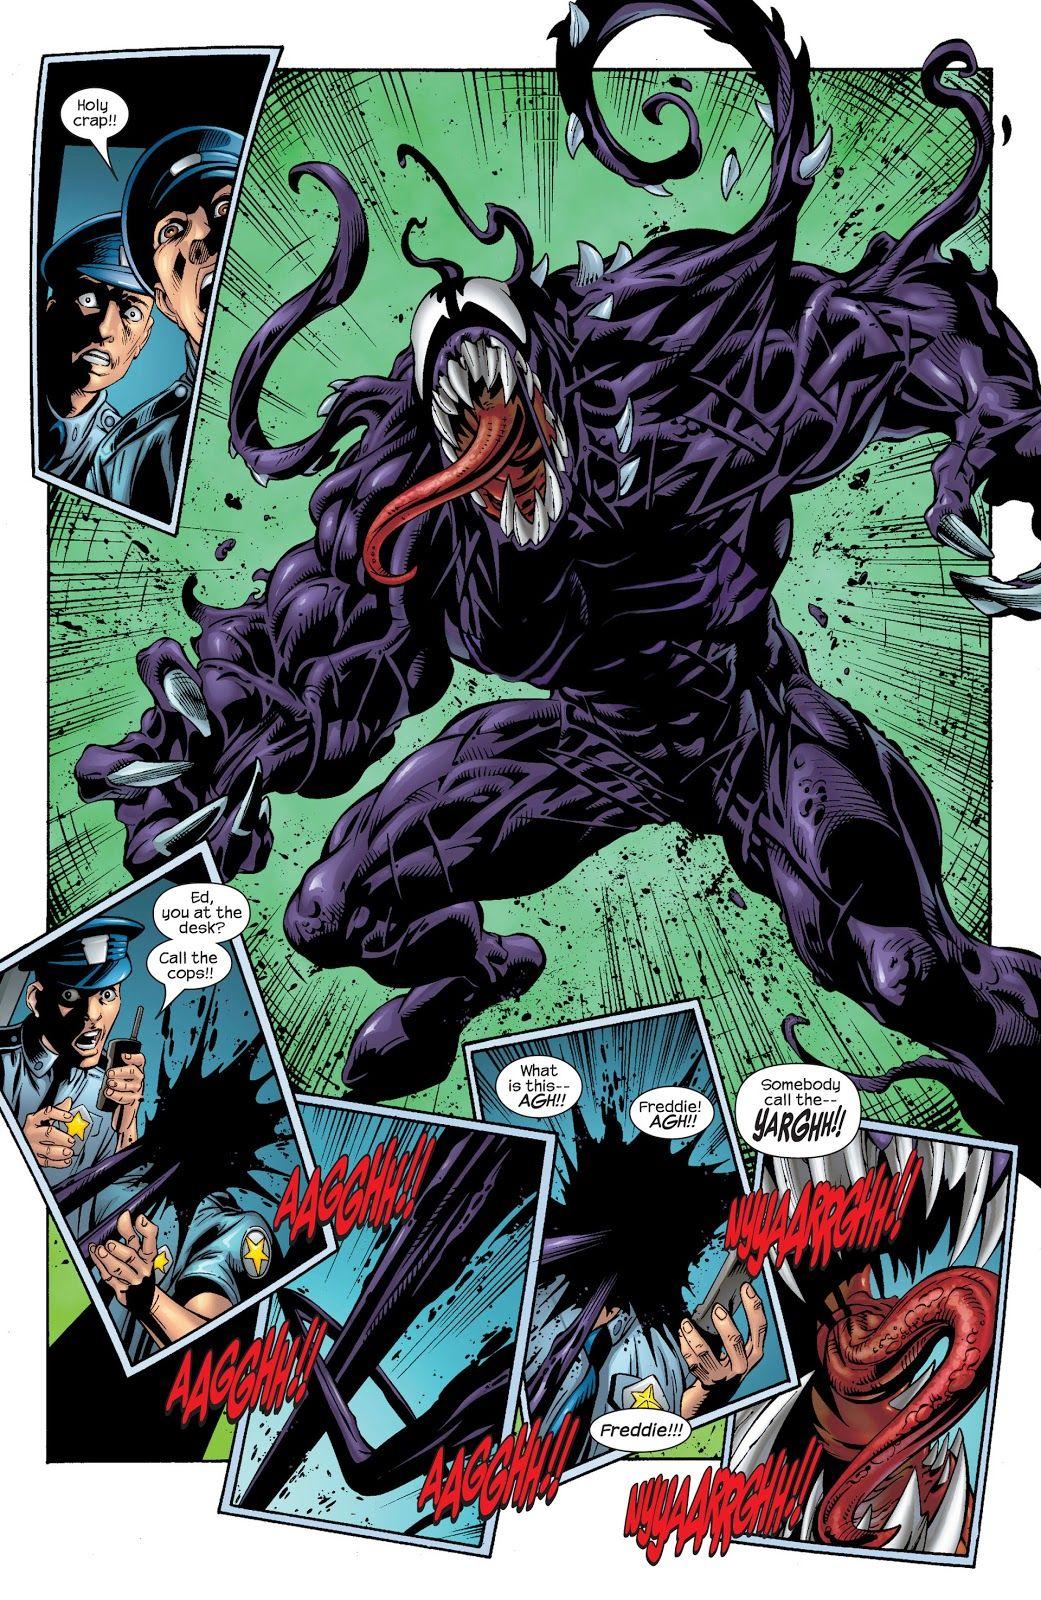 Ultimate Spider-man Venom : ultimate, spider-man, venom, Ultimate, Spider-Man, (2000), Issue, Comic, Online, Hig…, Spiderman,, Spiderman, Spider, Venom